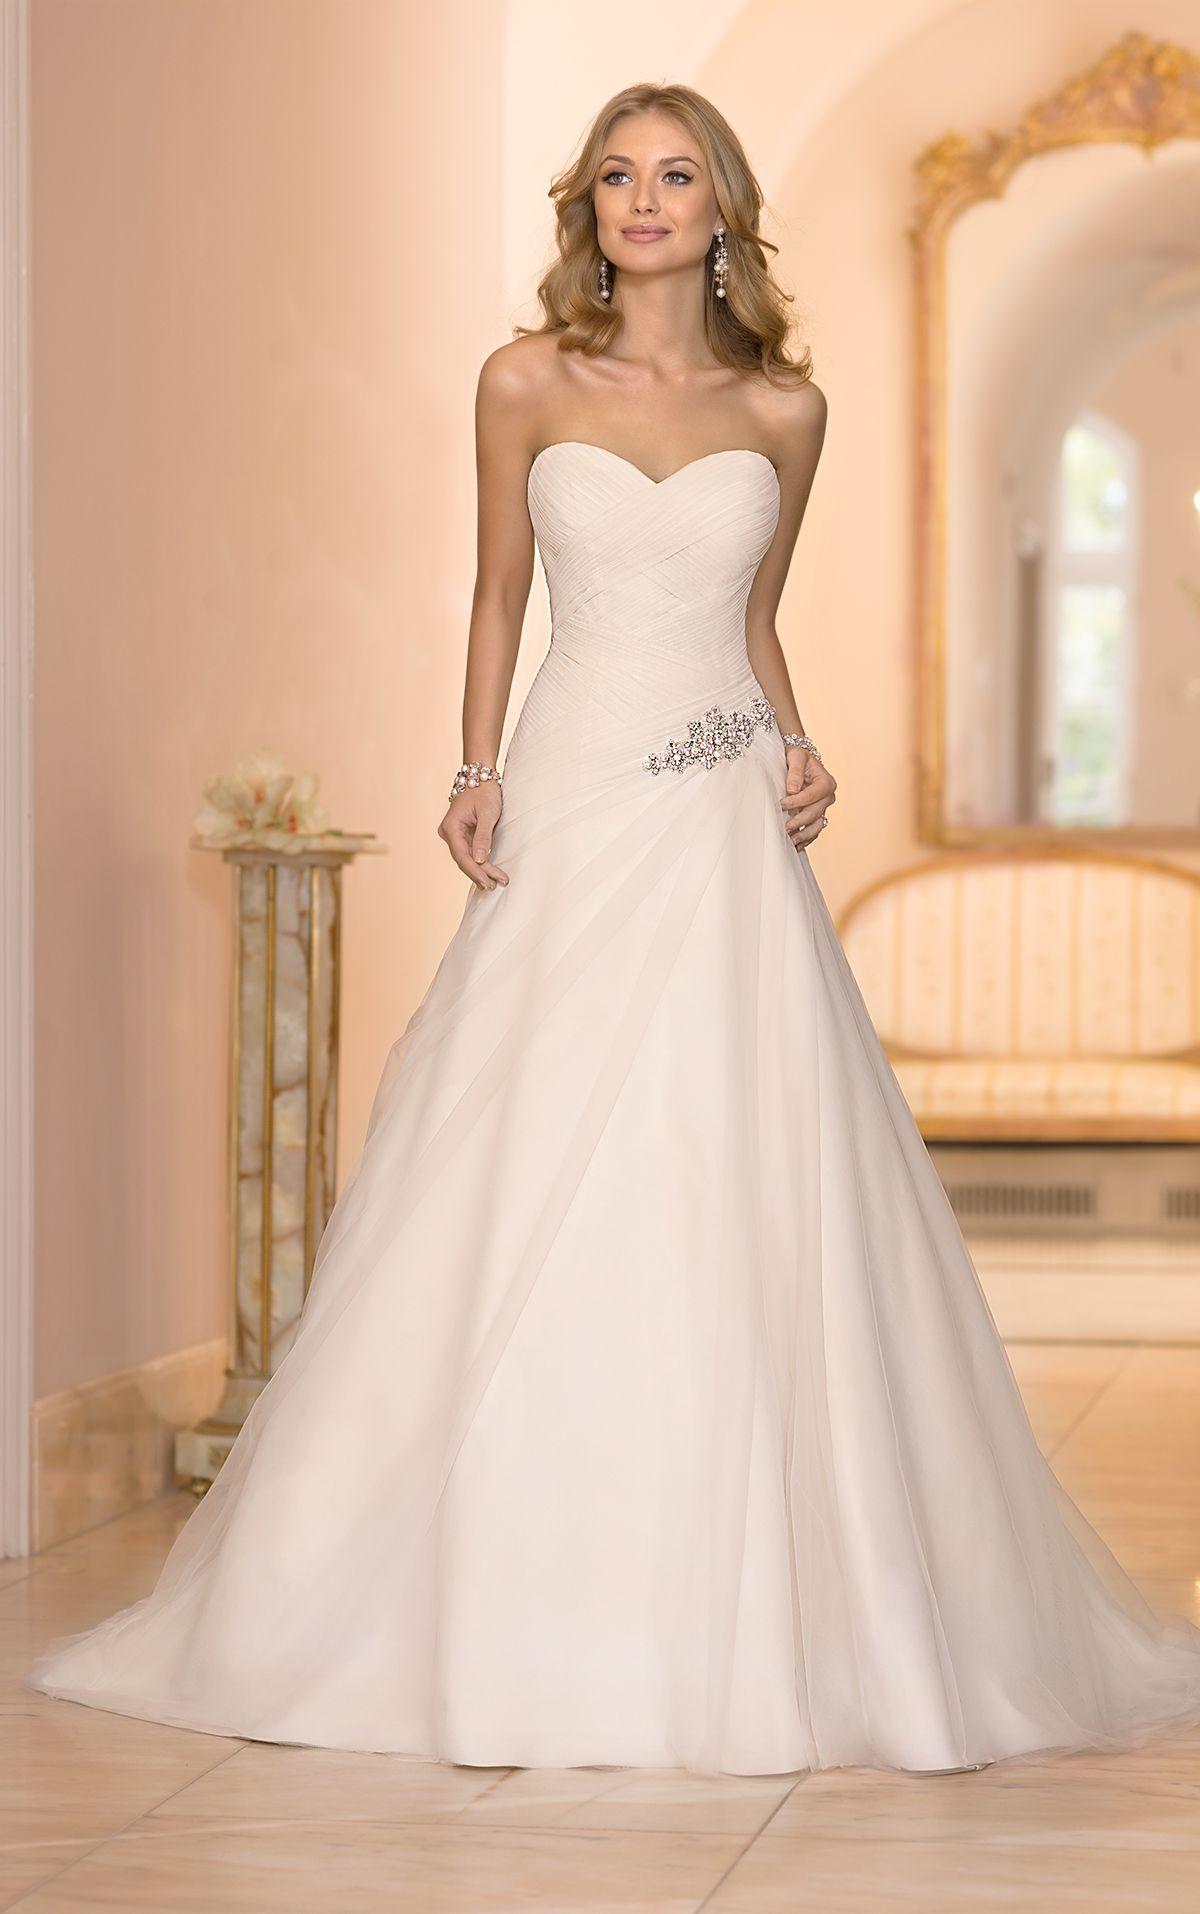 Extravagant Stella York Wedding Dresses | Wedding Dresses ...